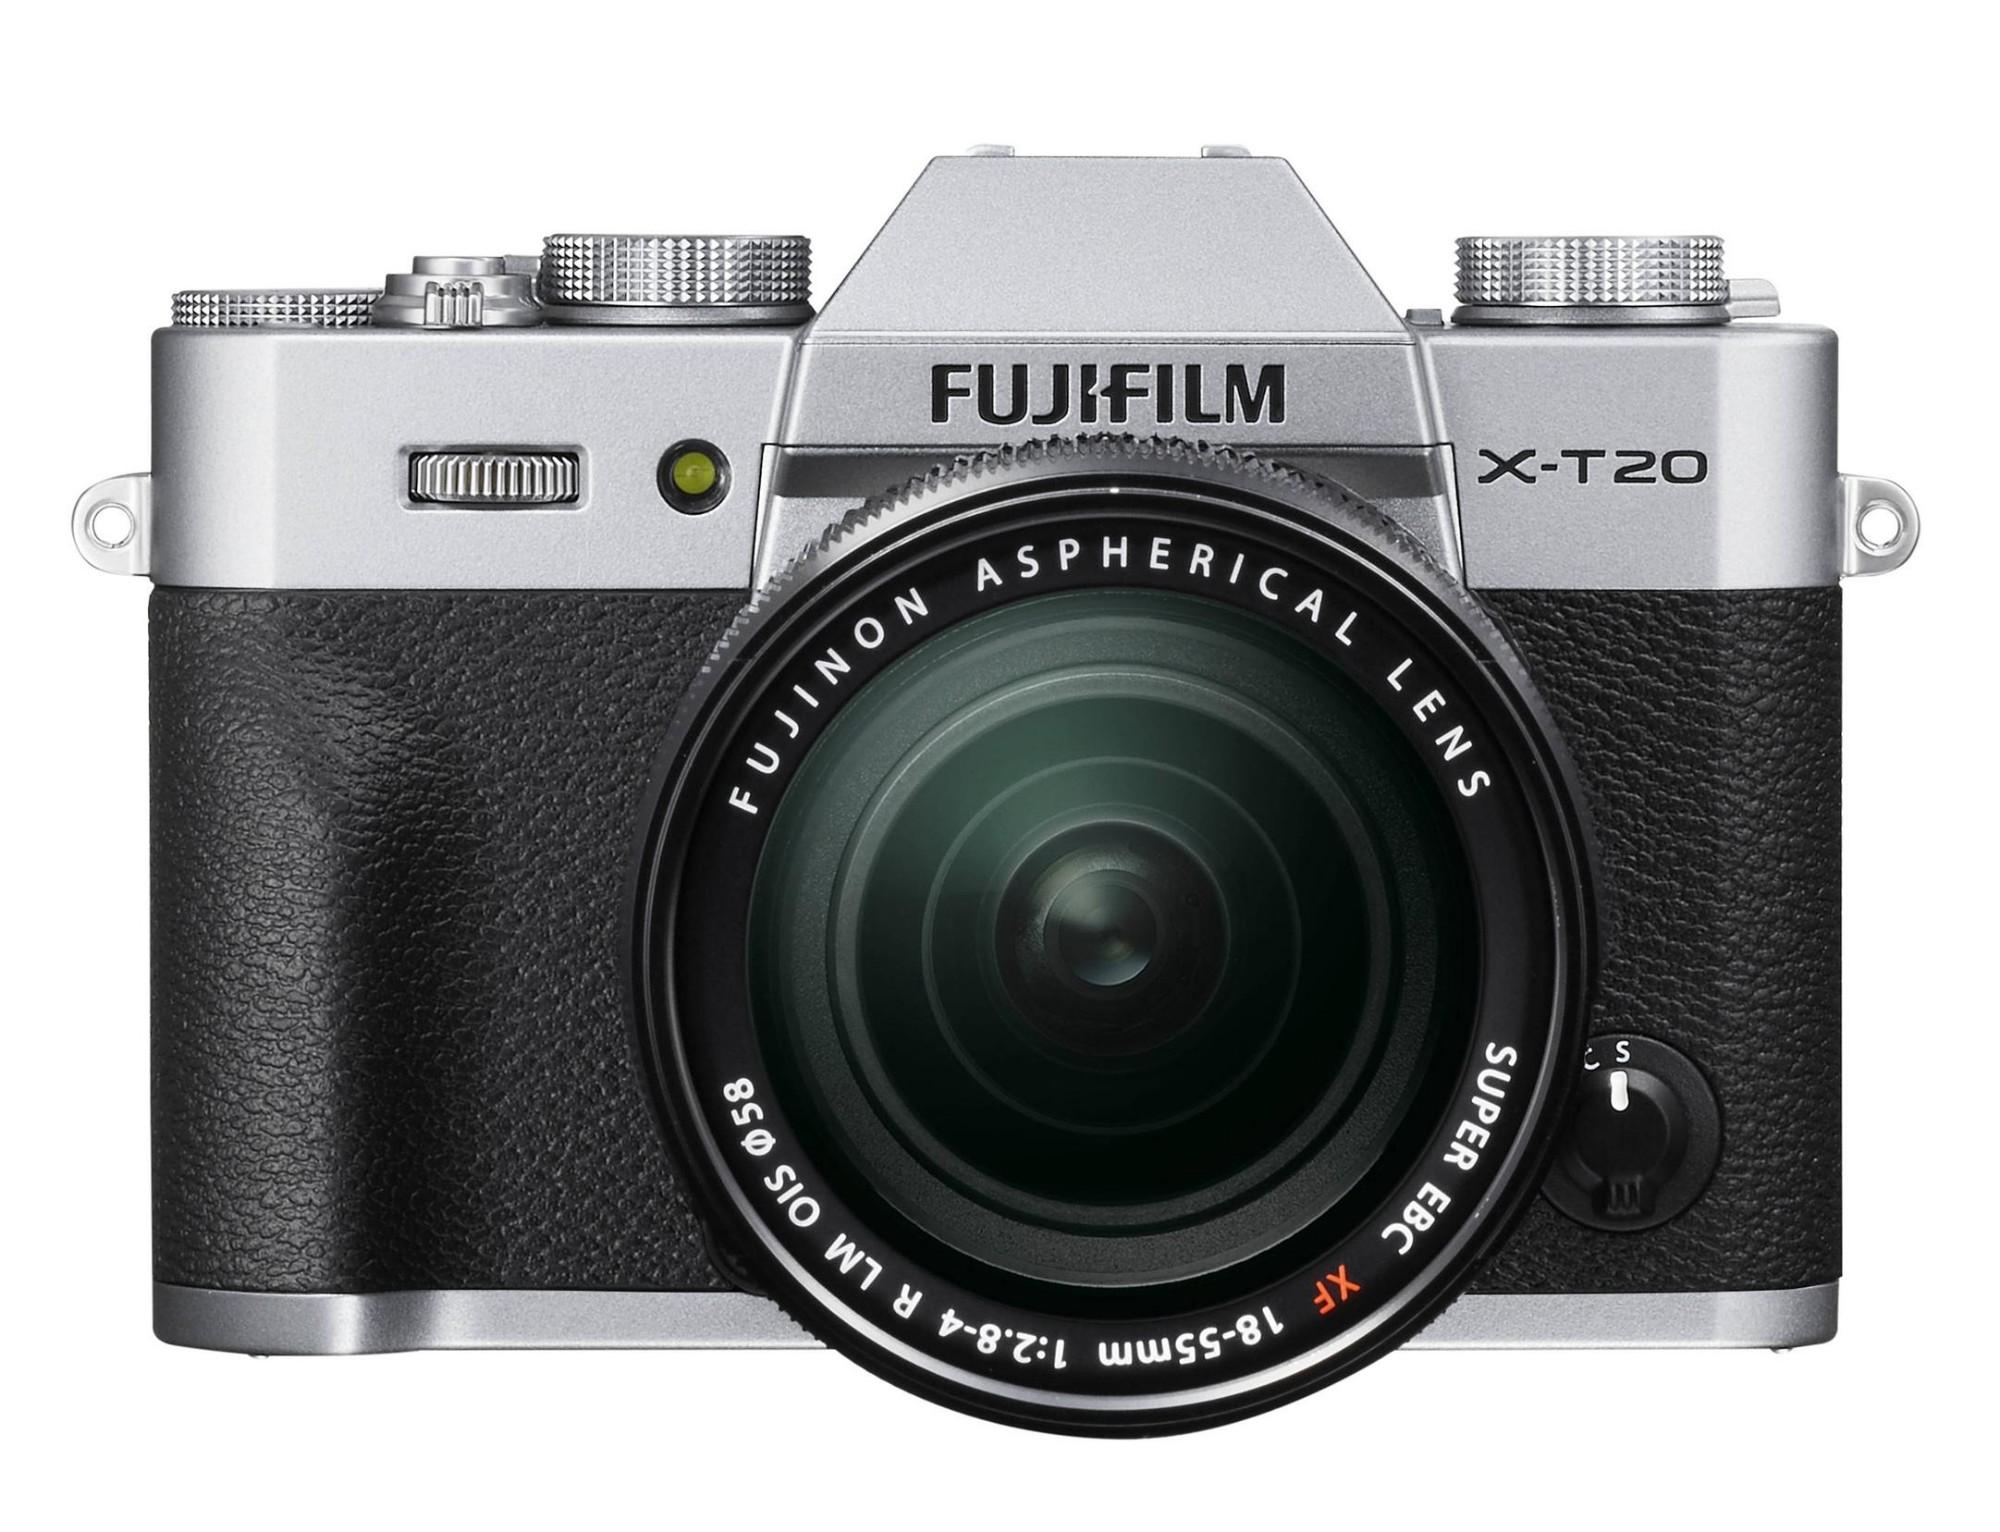 Fujifilm X T20 + XF 18-55mm F 2.8-4 R LM OIS MILC 24.3MP CMOS III 6000 x 4000pixels Black,Silver